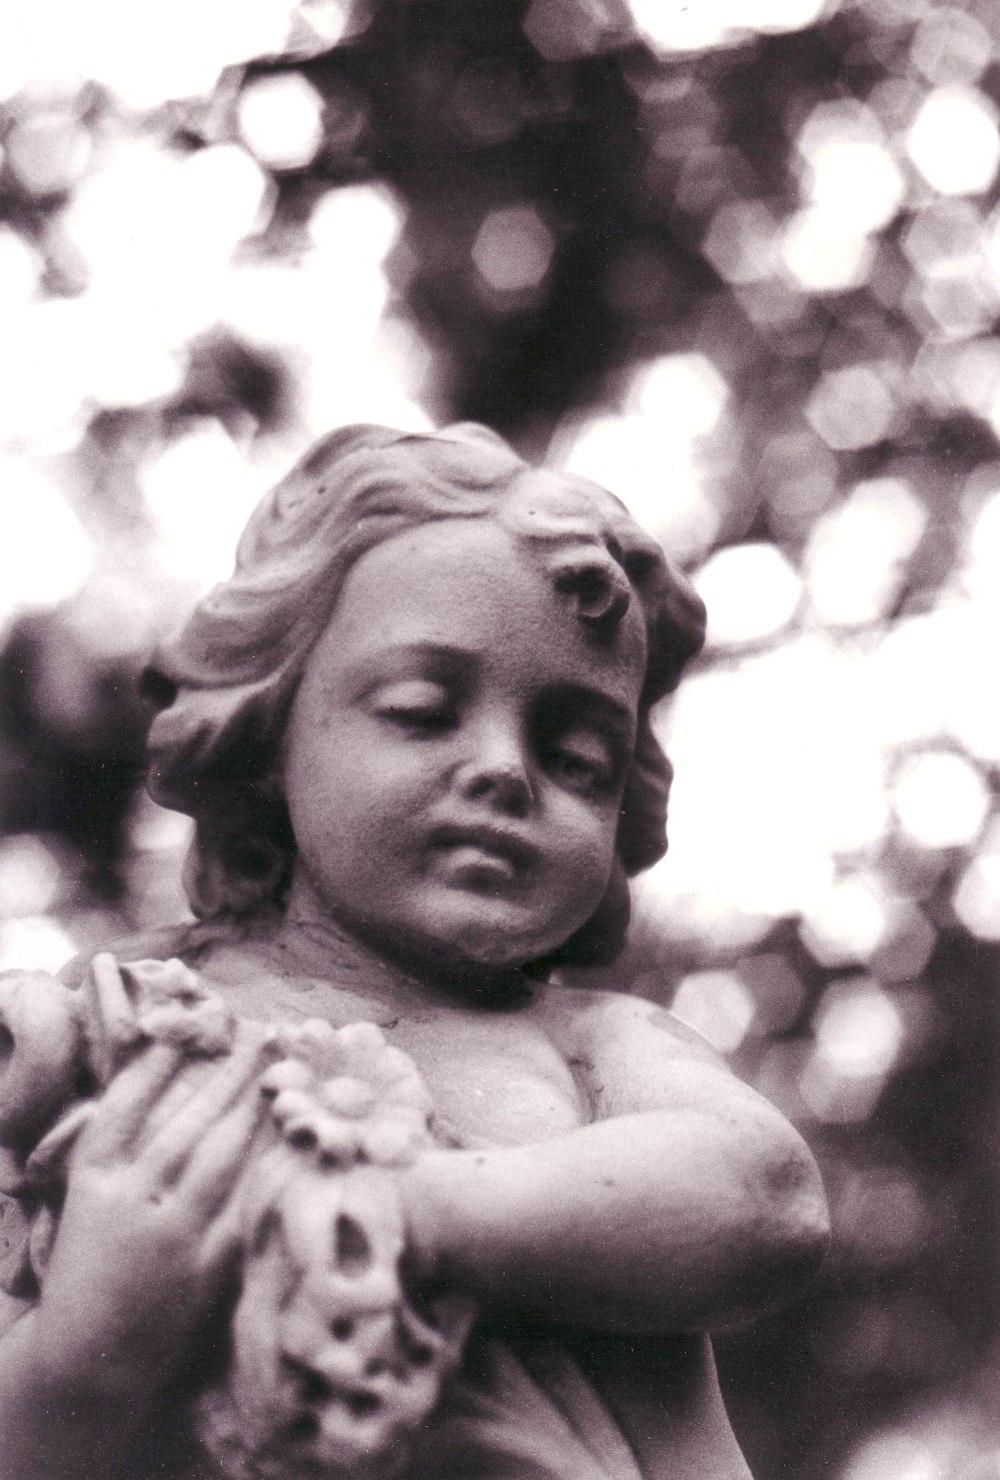 baby angel highgate, London